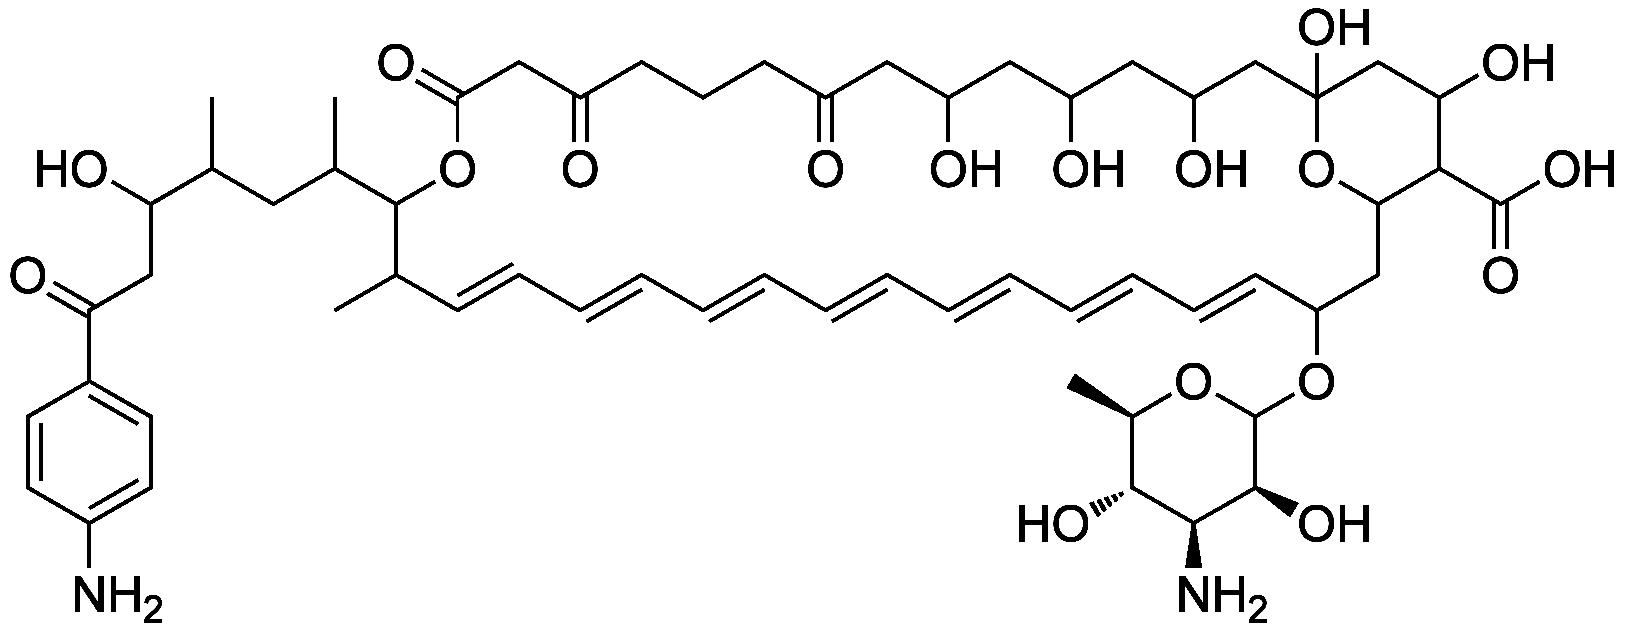 candicidin structure